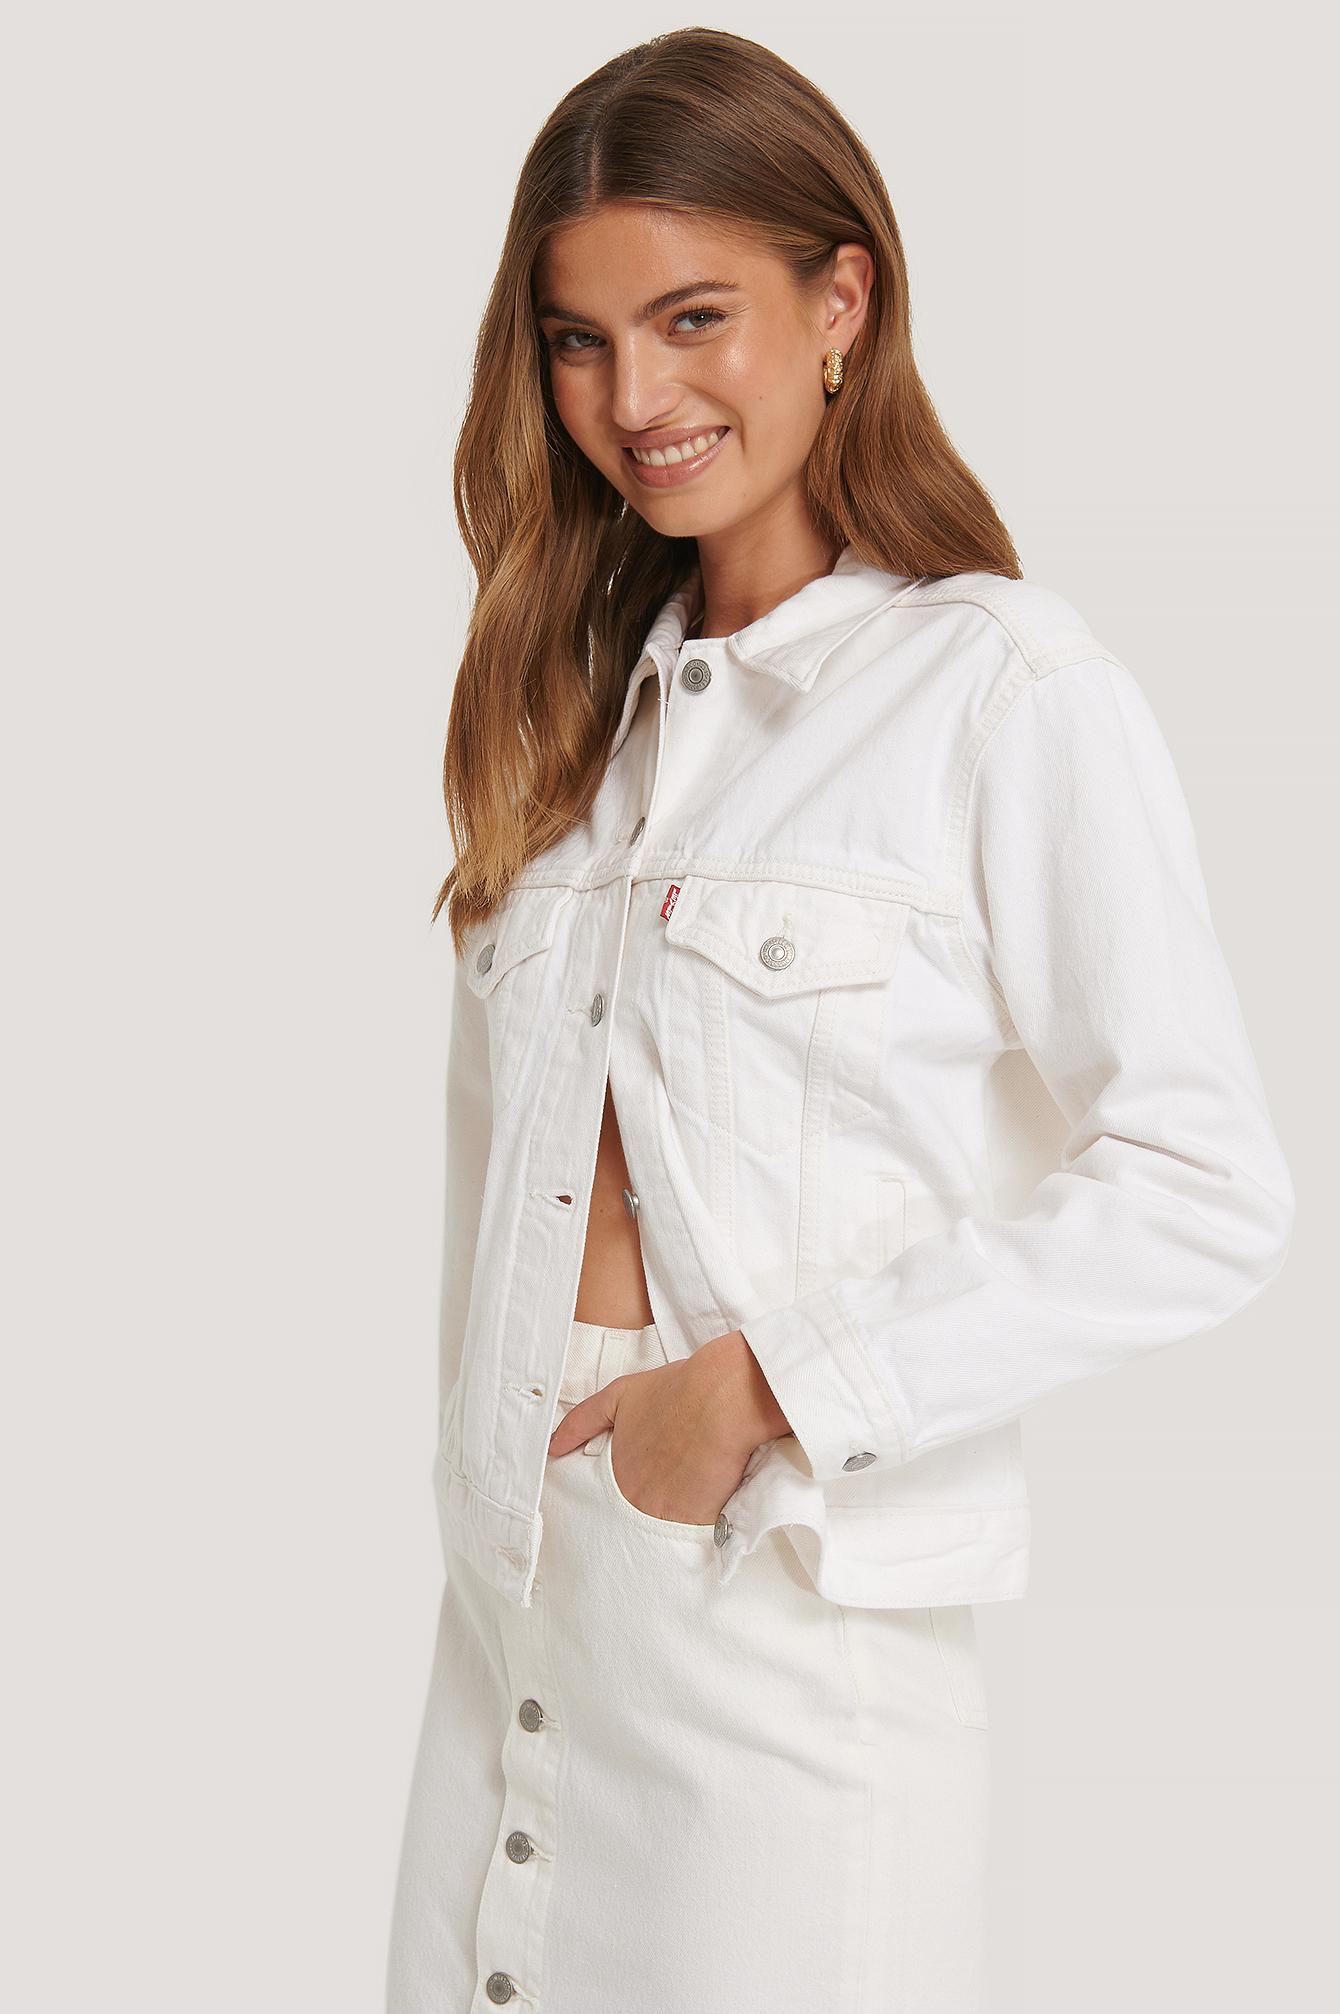 Levi's Jeansjacke - White   Bekleidung > Jacken > Jeansjacken   Levi's